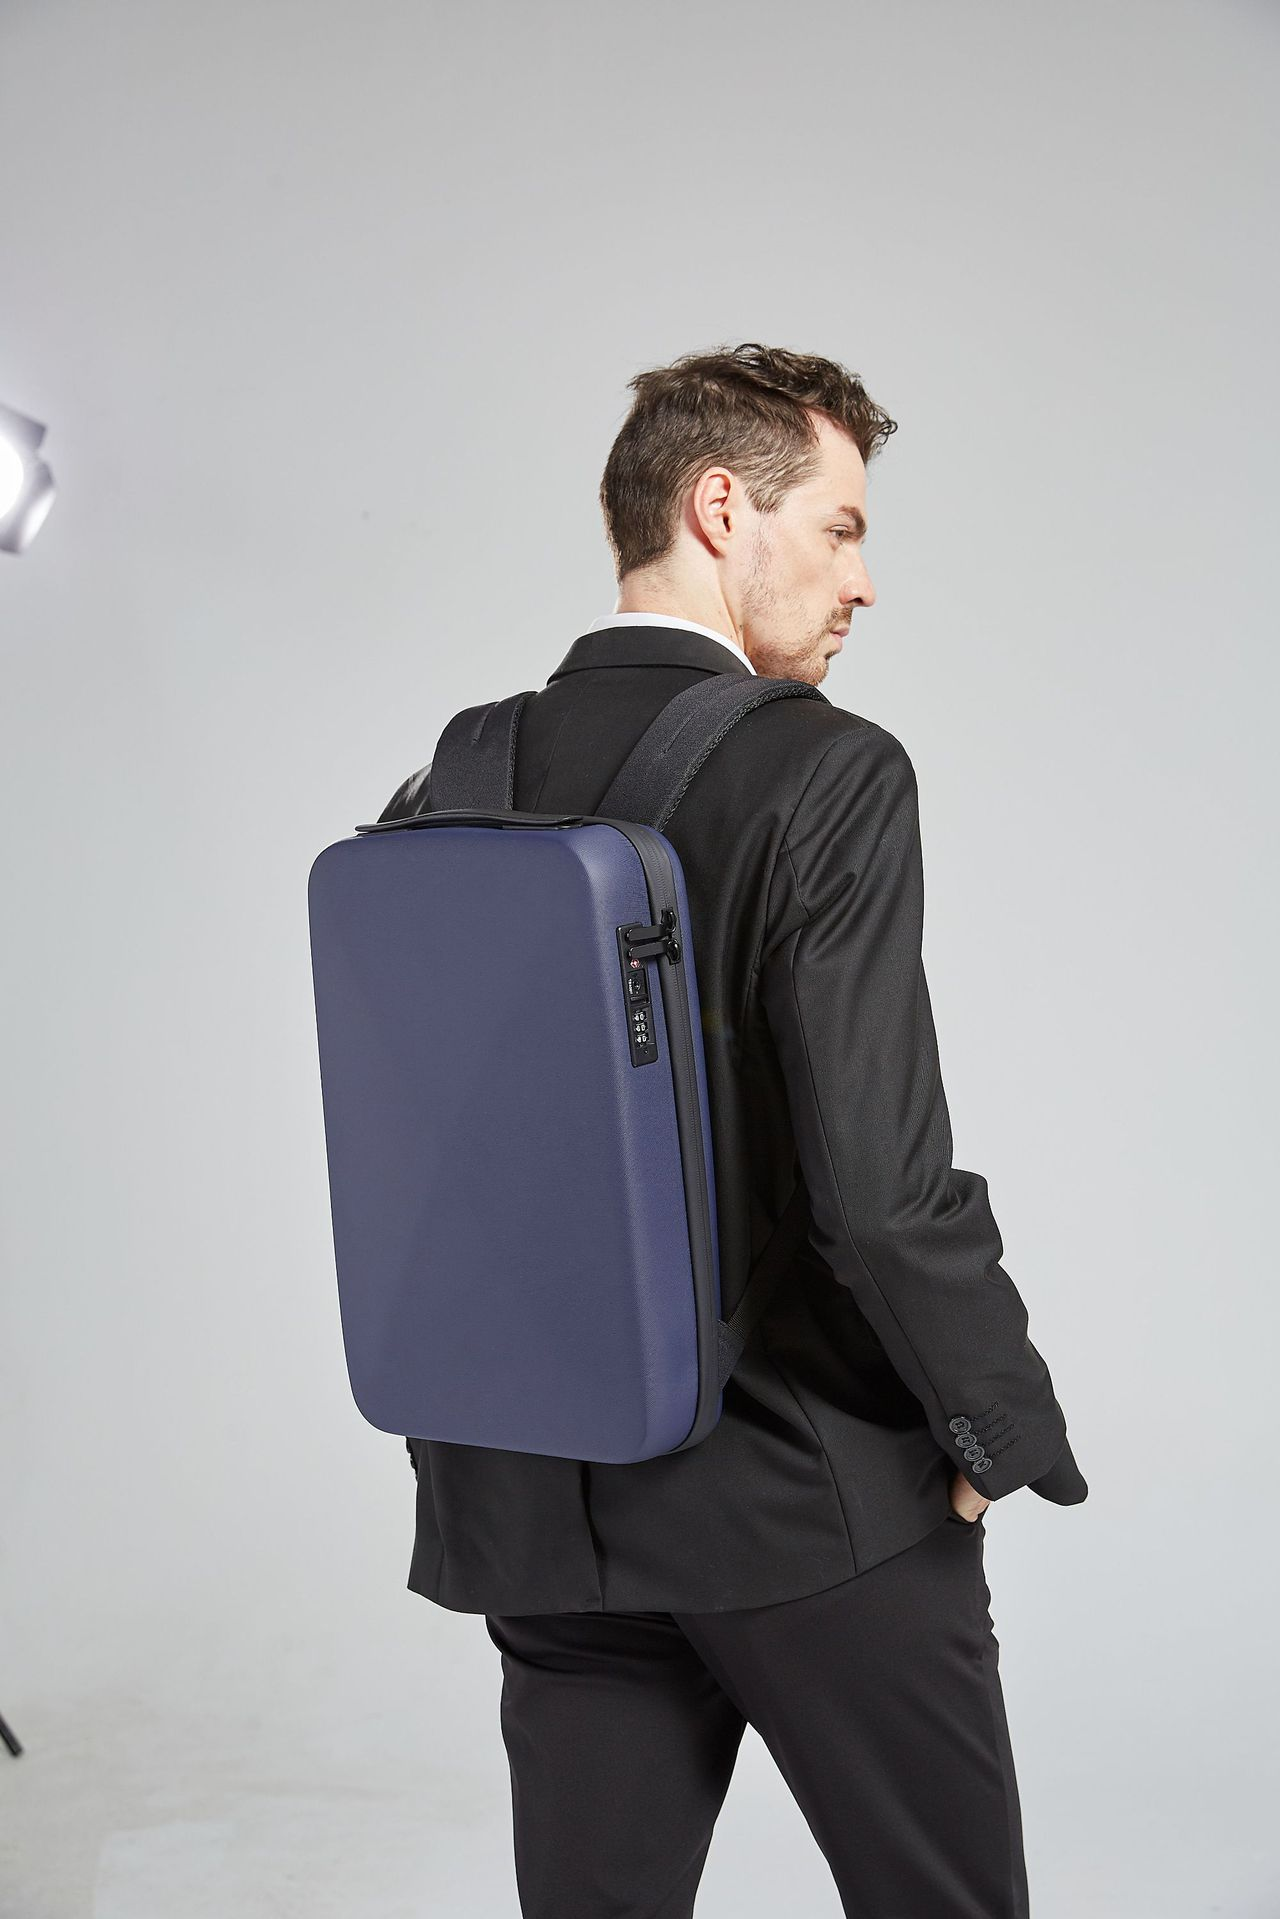 anti-roubo moda negócios senha bloqueio daypacks estilo